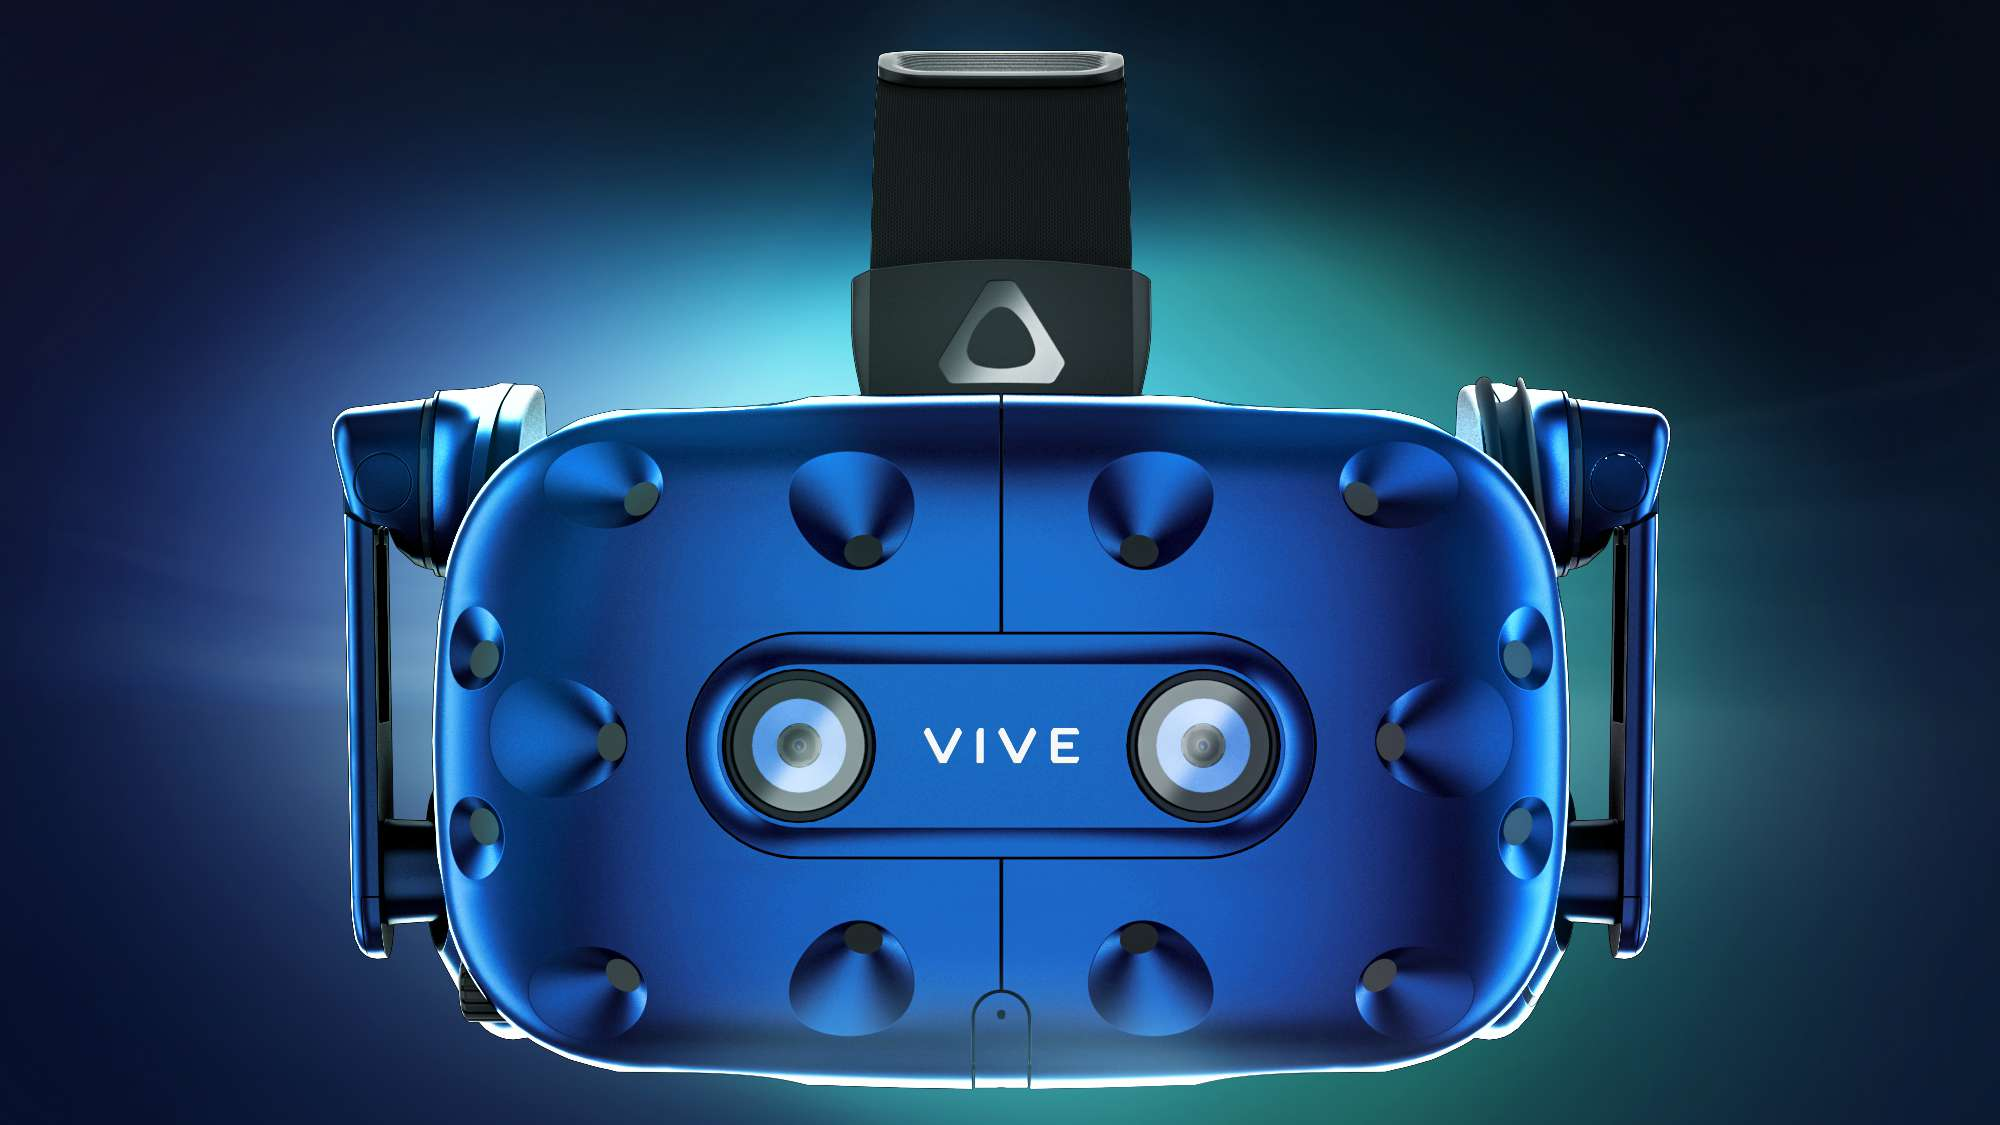 Blue Vive Pro VR headset